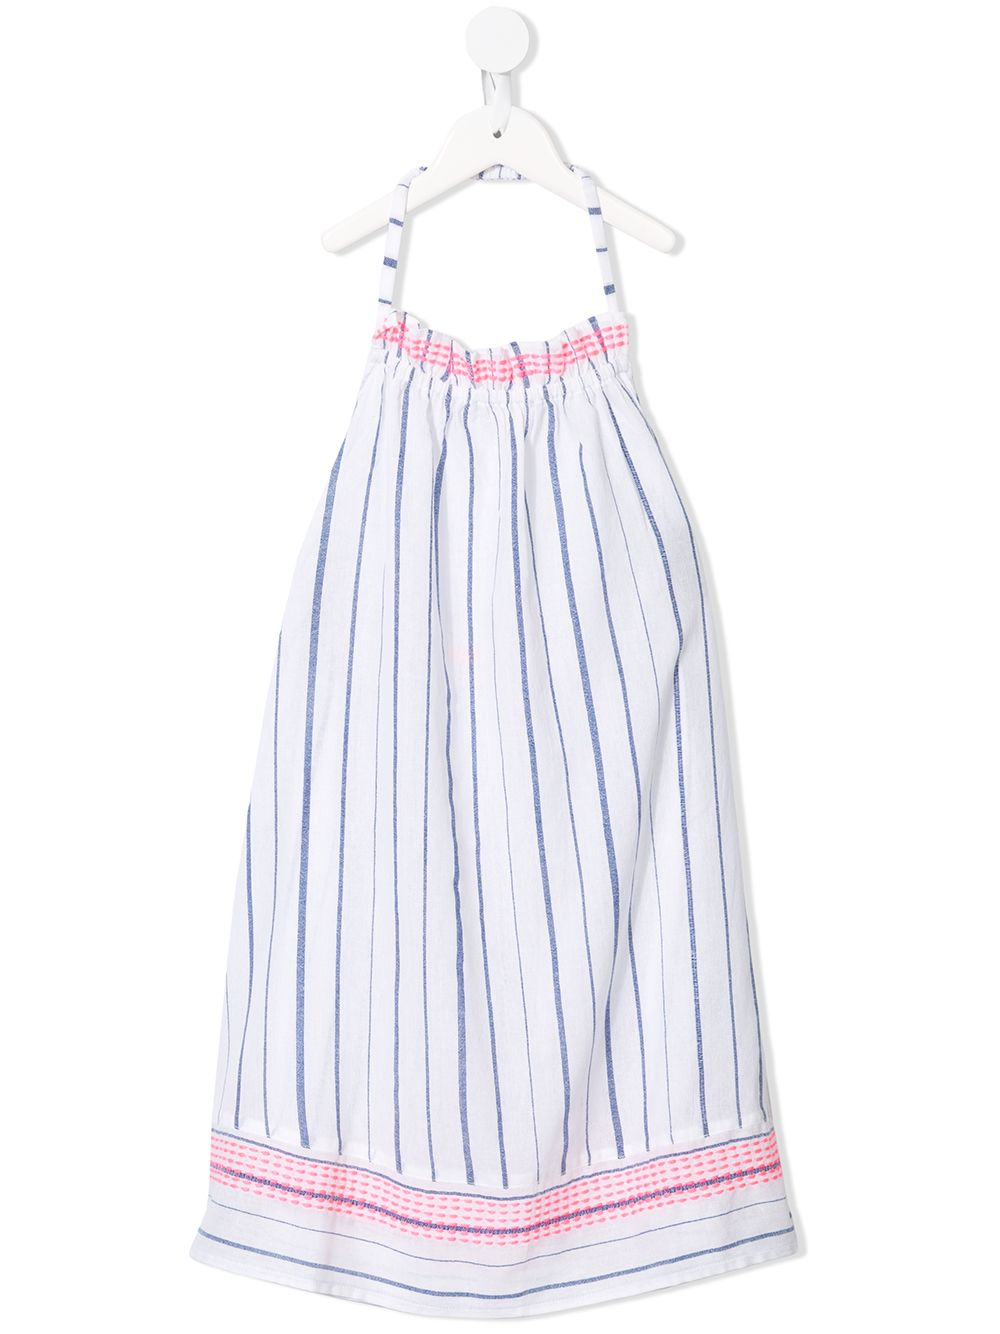 SUNUVA   Sunuva полосатое платье с вырезом халтер   Clouty